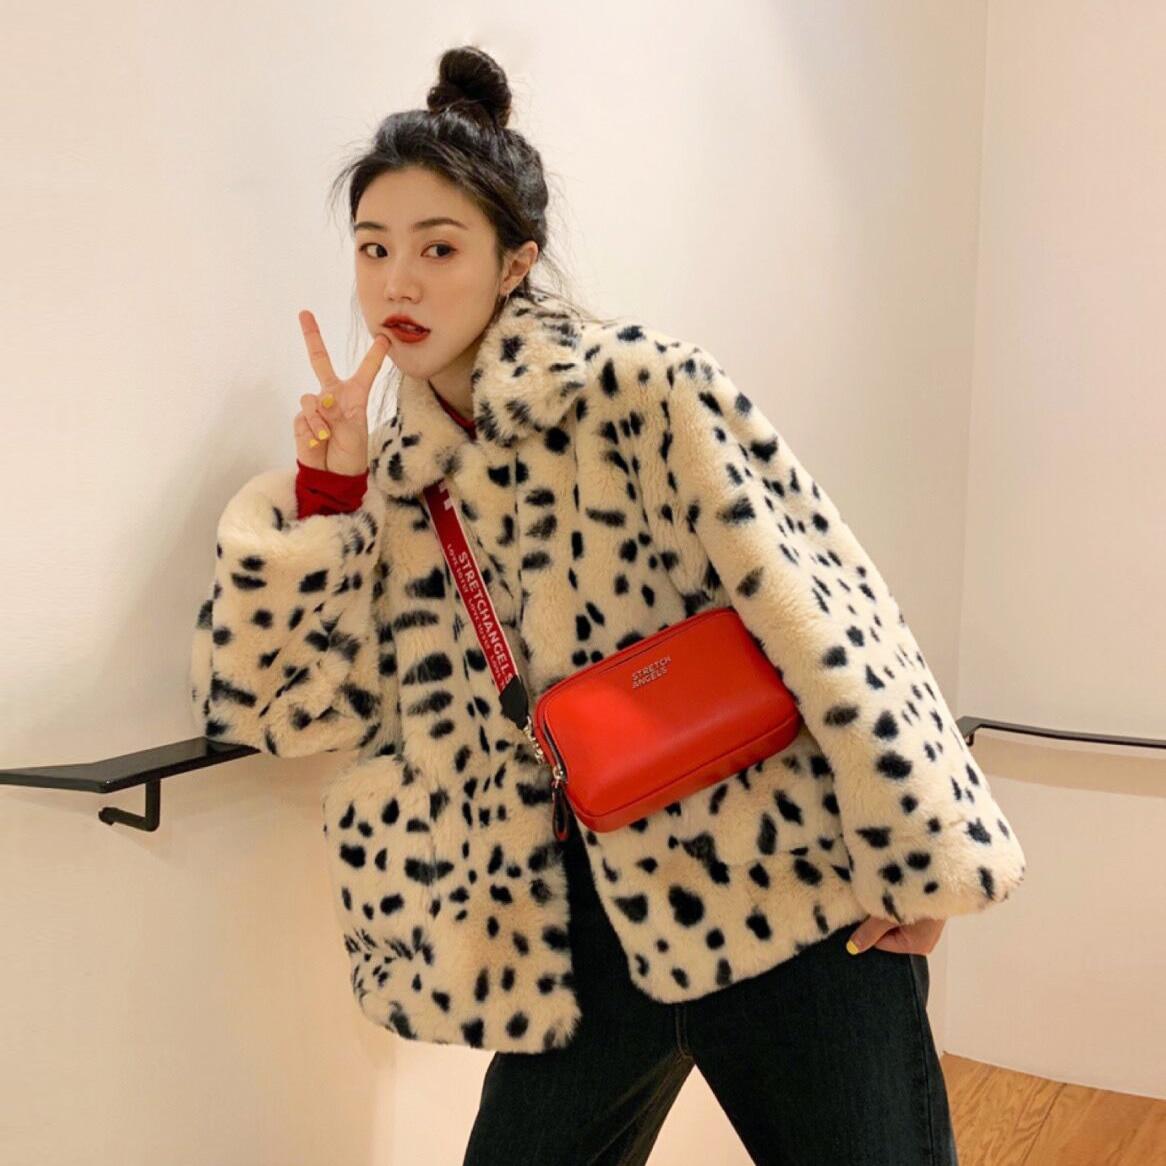 H761c05e25b294fc1953a31e0039340323 Plush jacket women winter short 2021 new Korean version of loose lamb wool faux fur leopard print fur coat women winter